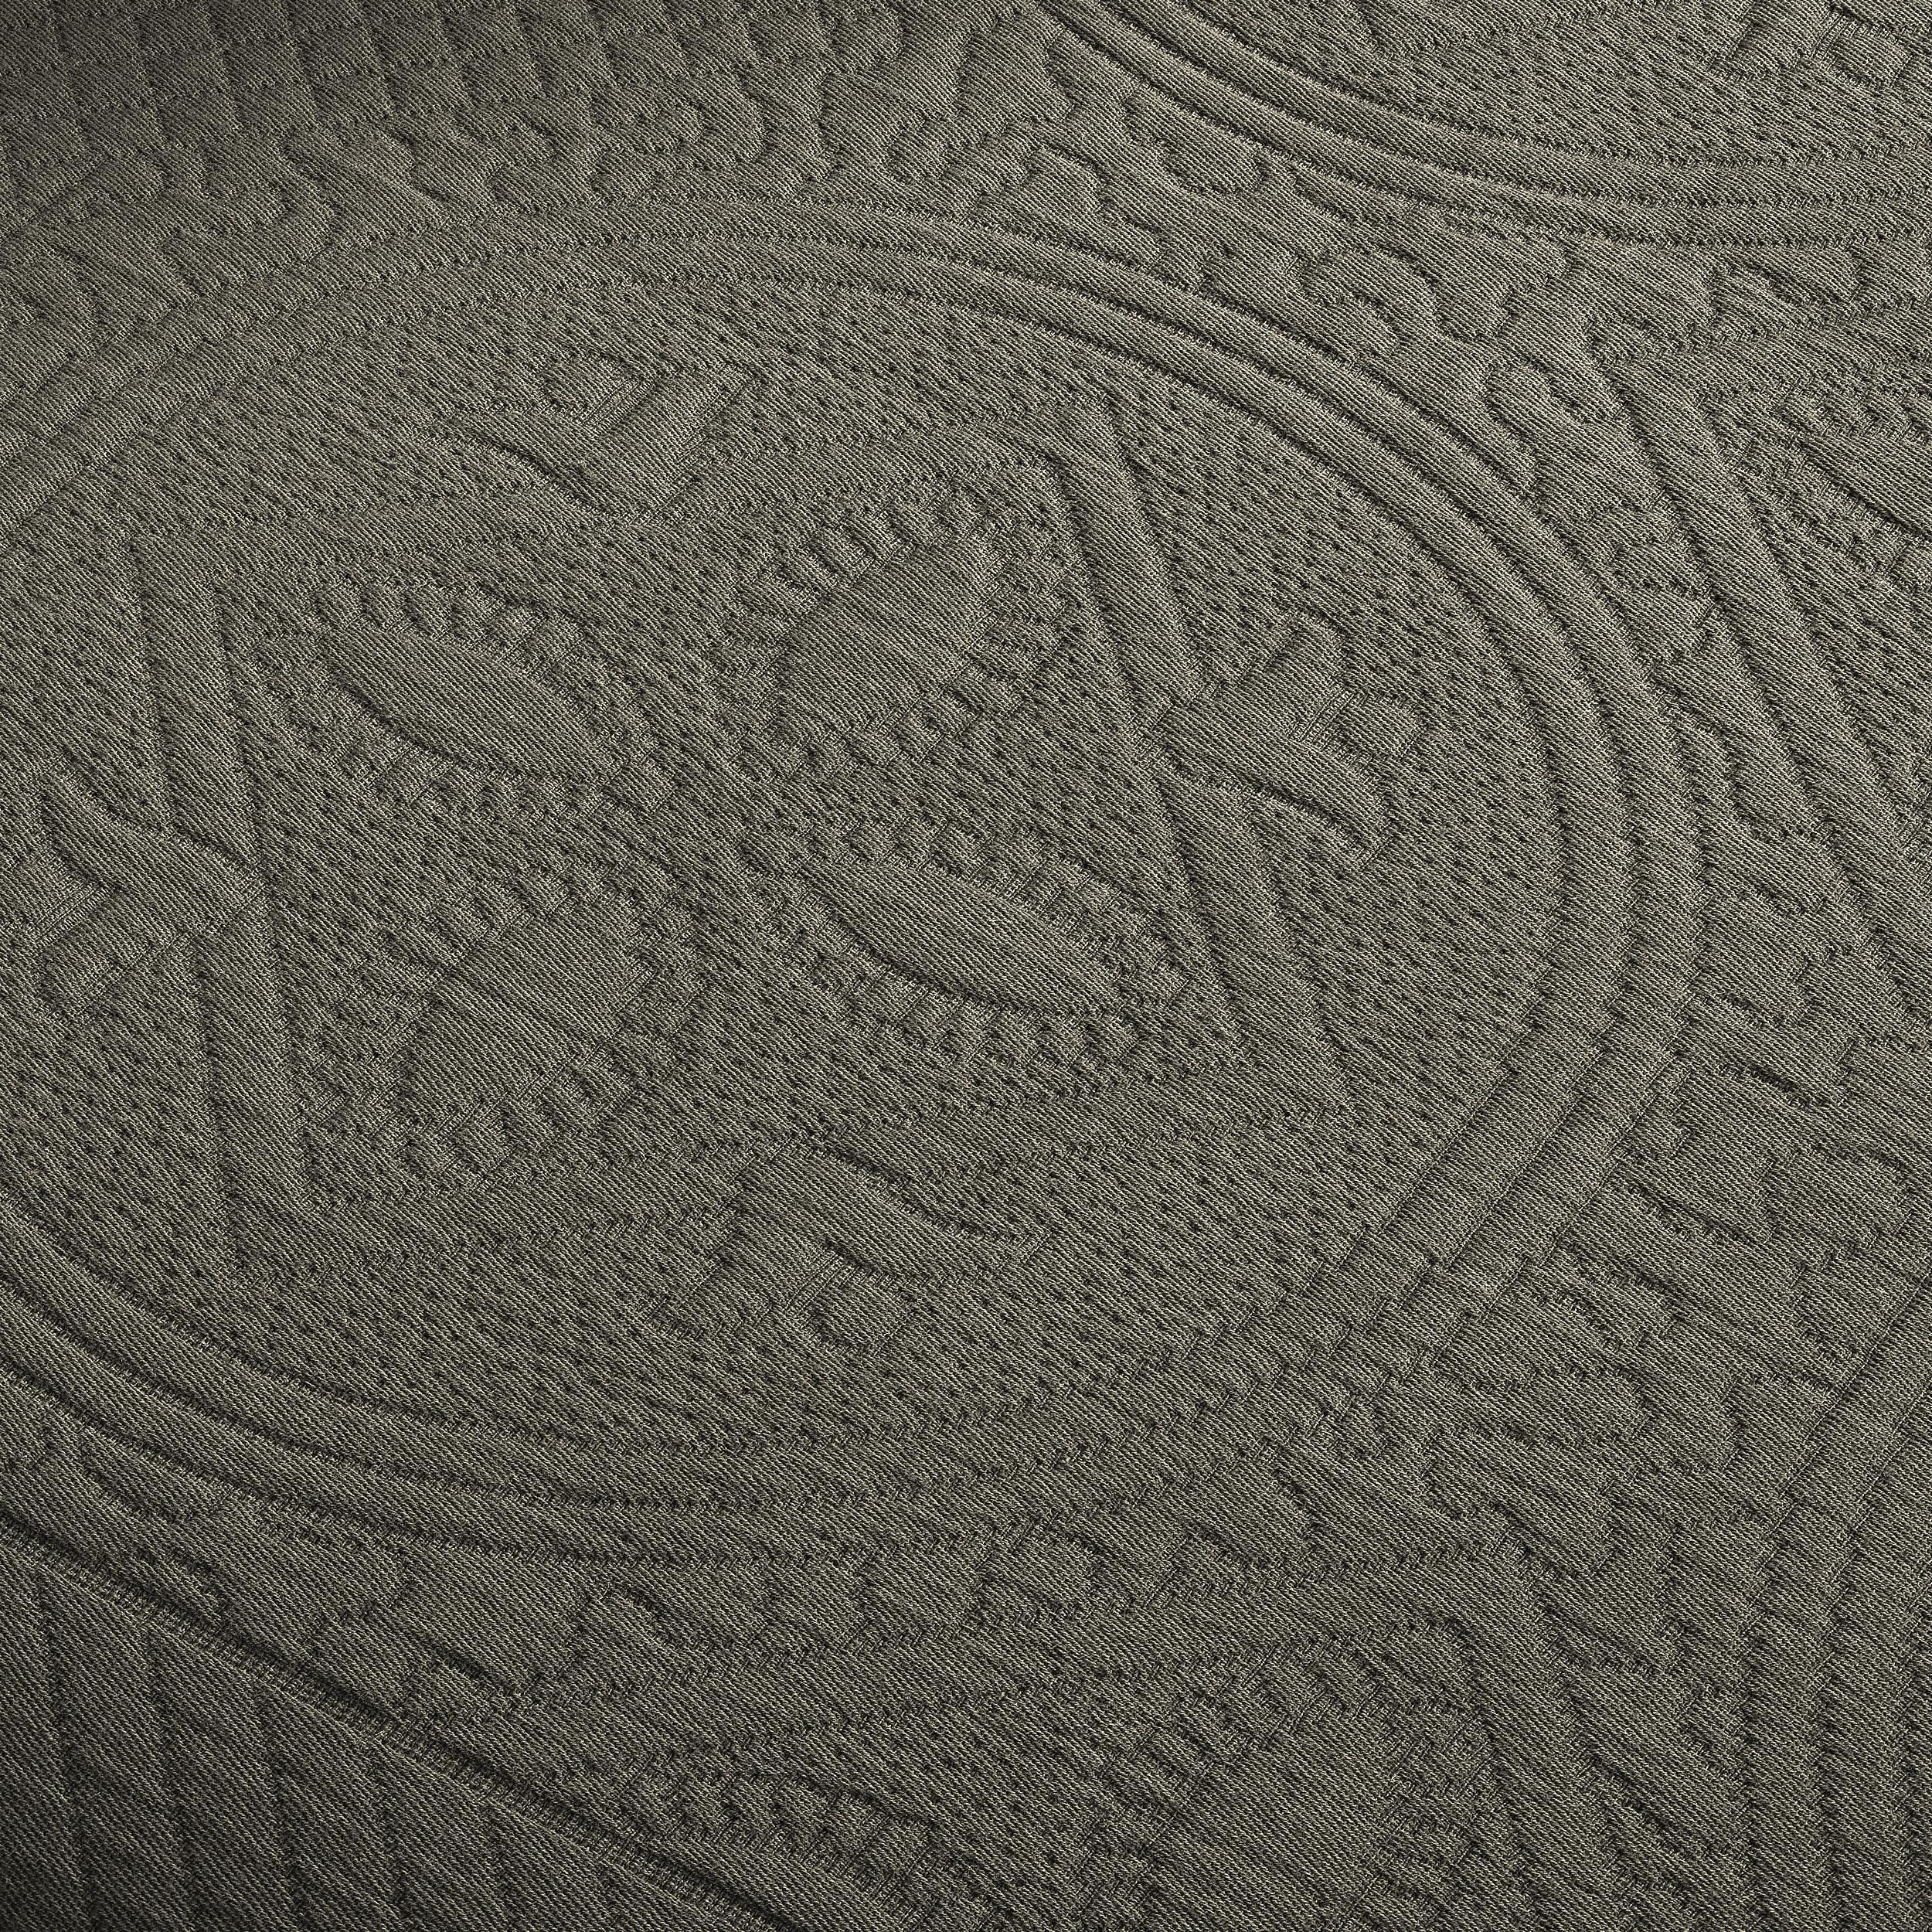 Celtic-Circle-Cotton-Jacquard-Matelasse-Scalloped-Bedspread-Set thumbnail 14